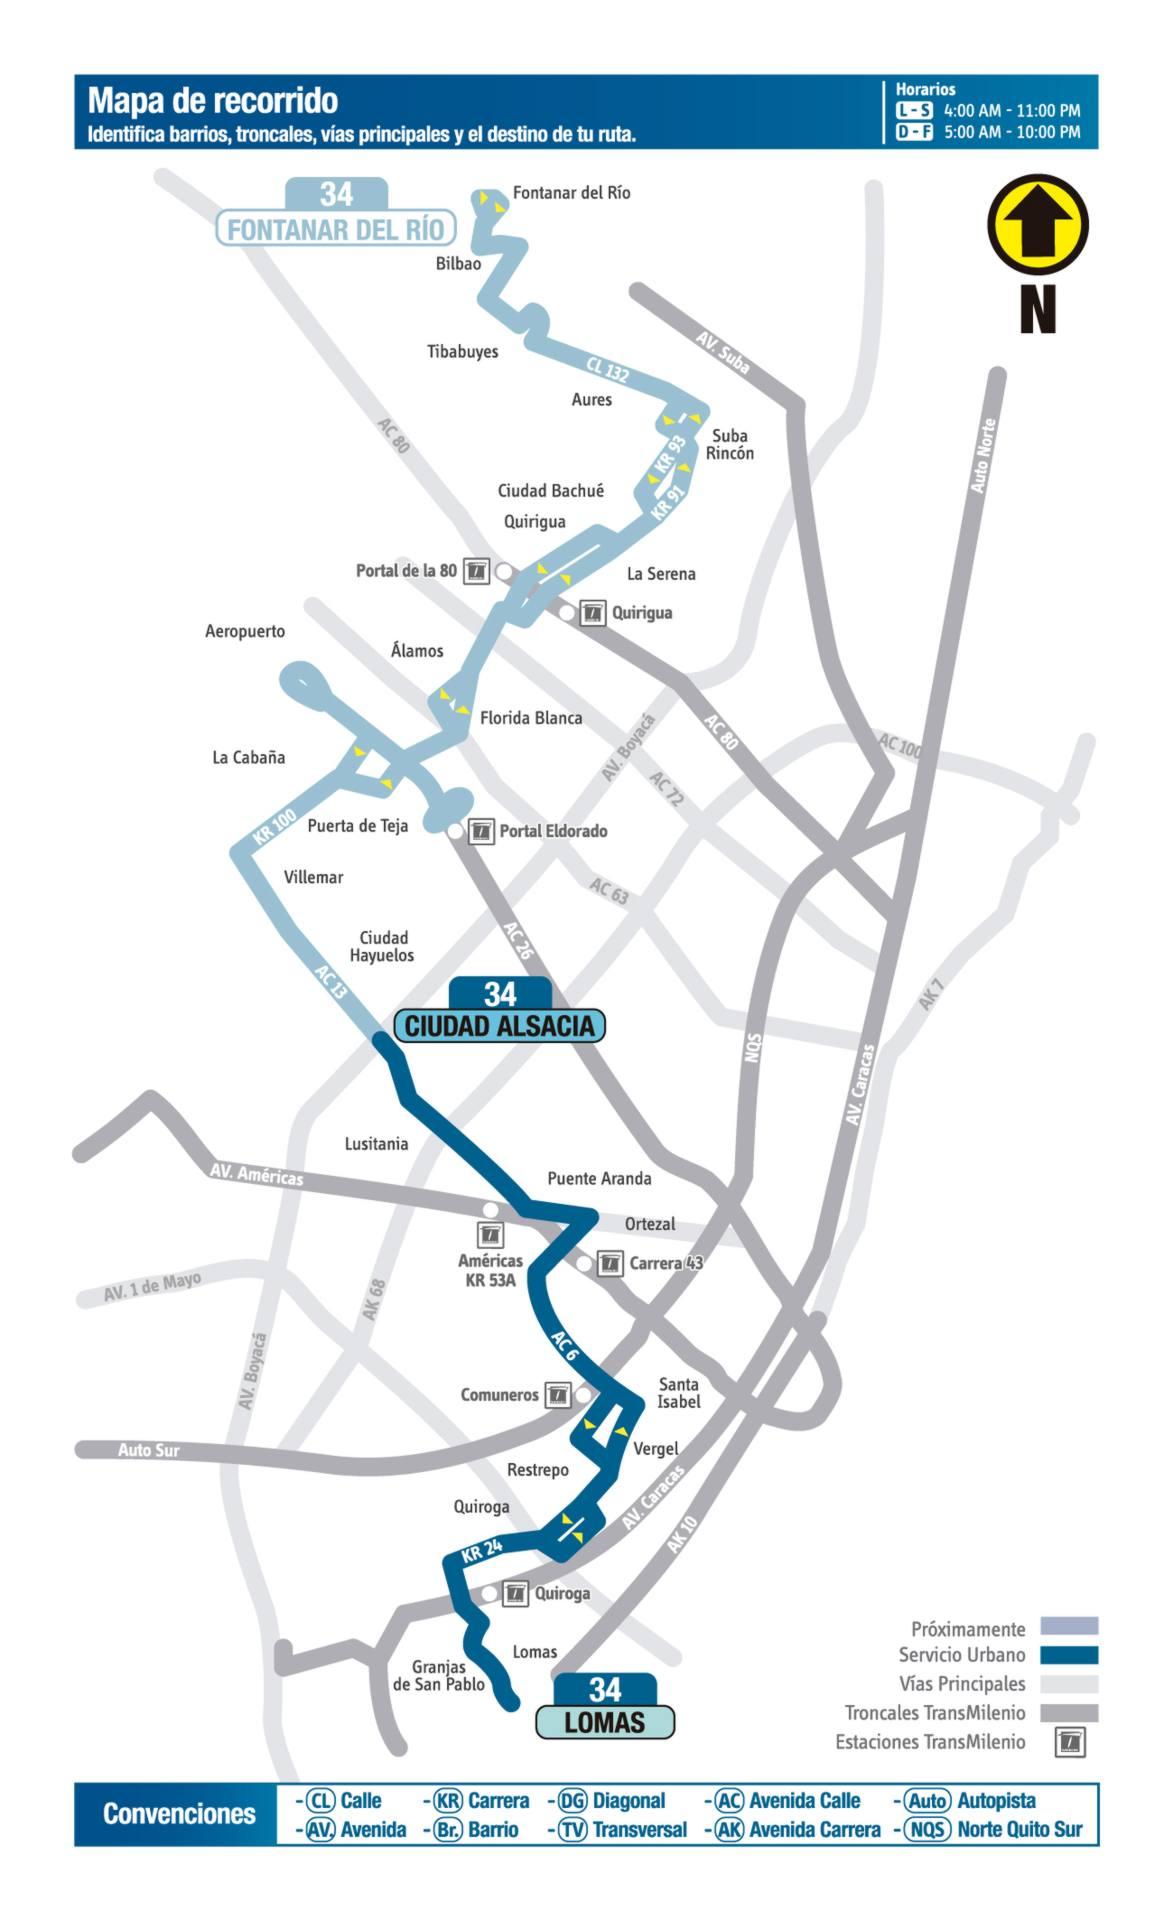 34_ruta_sitp_mapa_urbana_bogota_2016_optimized